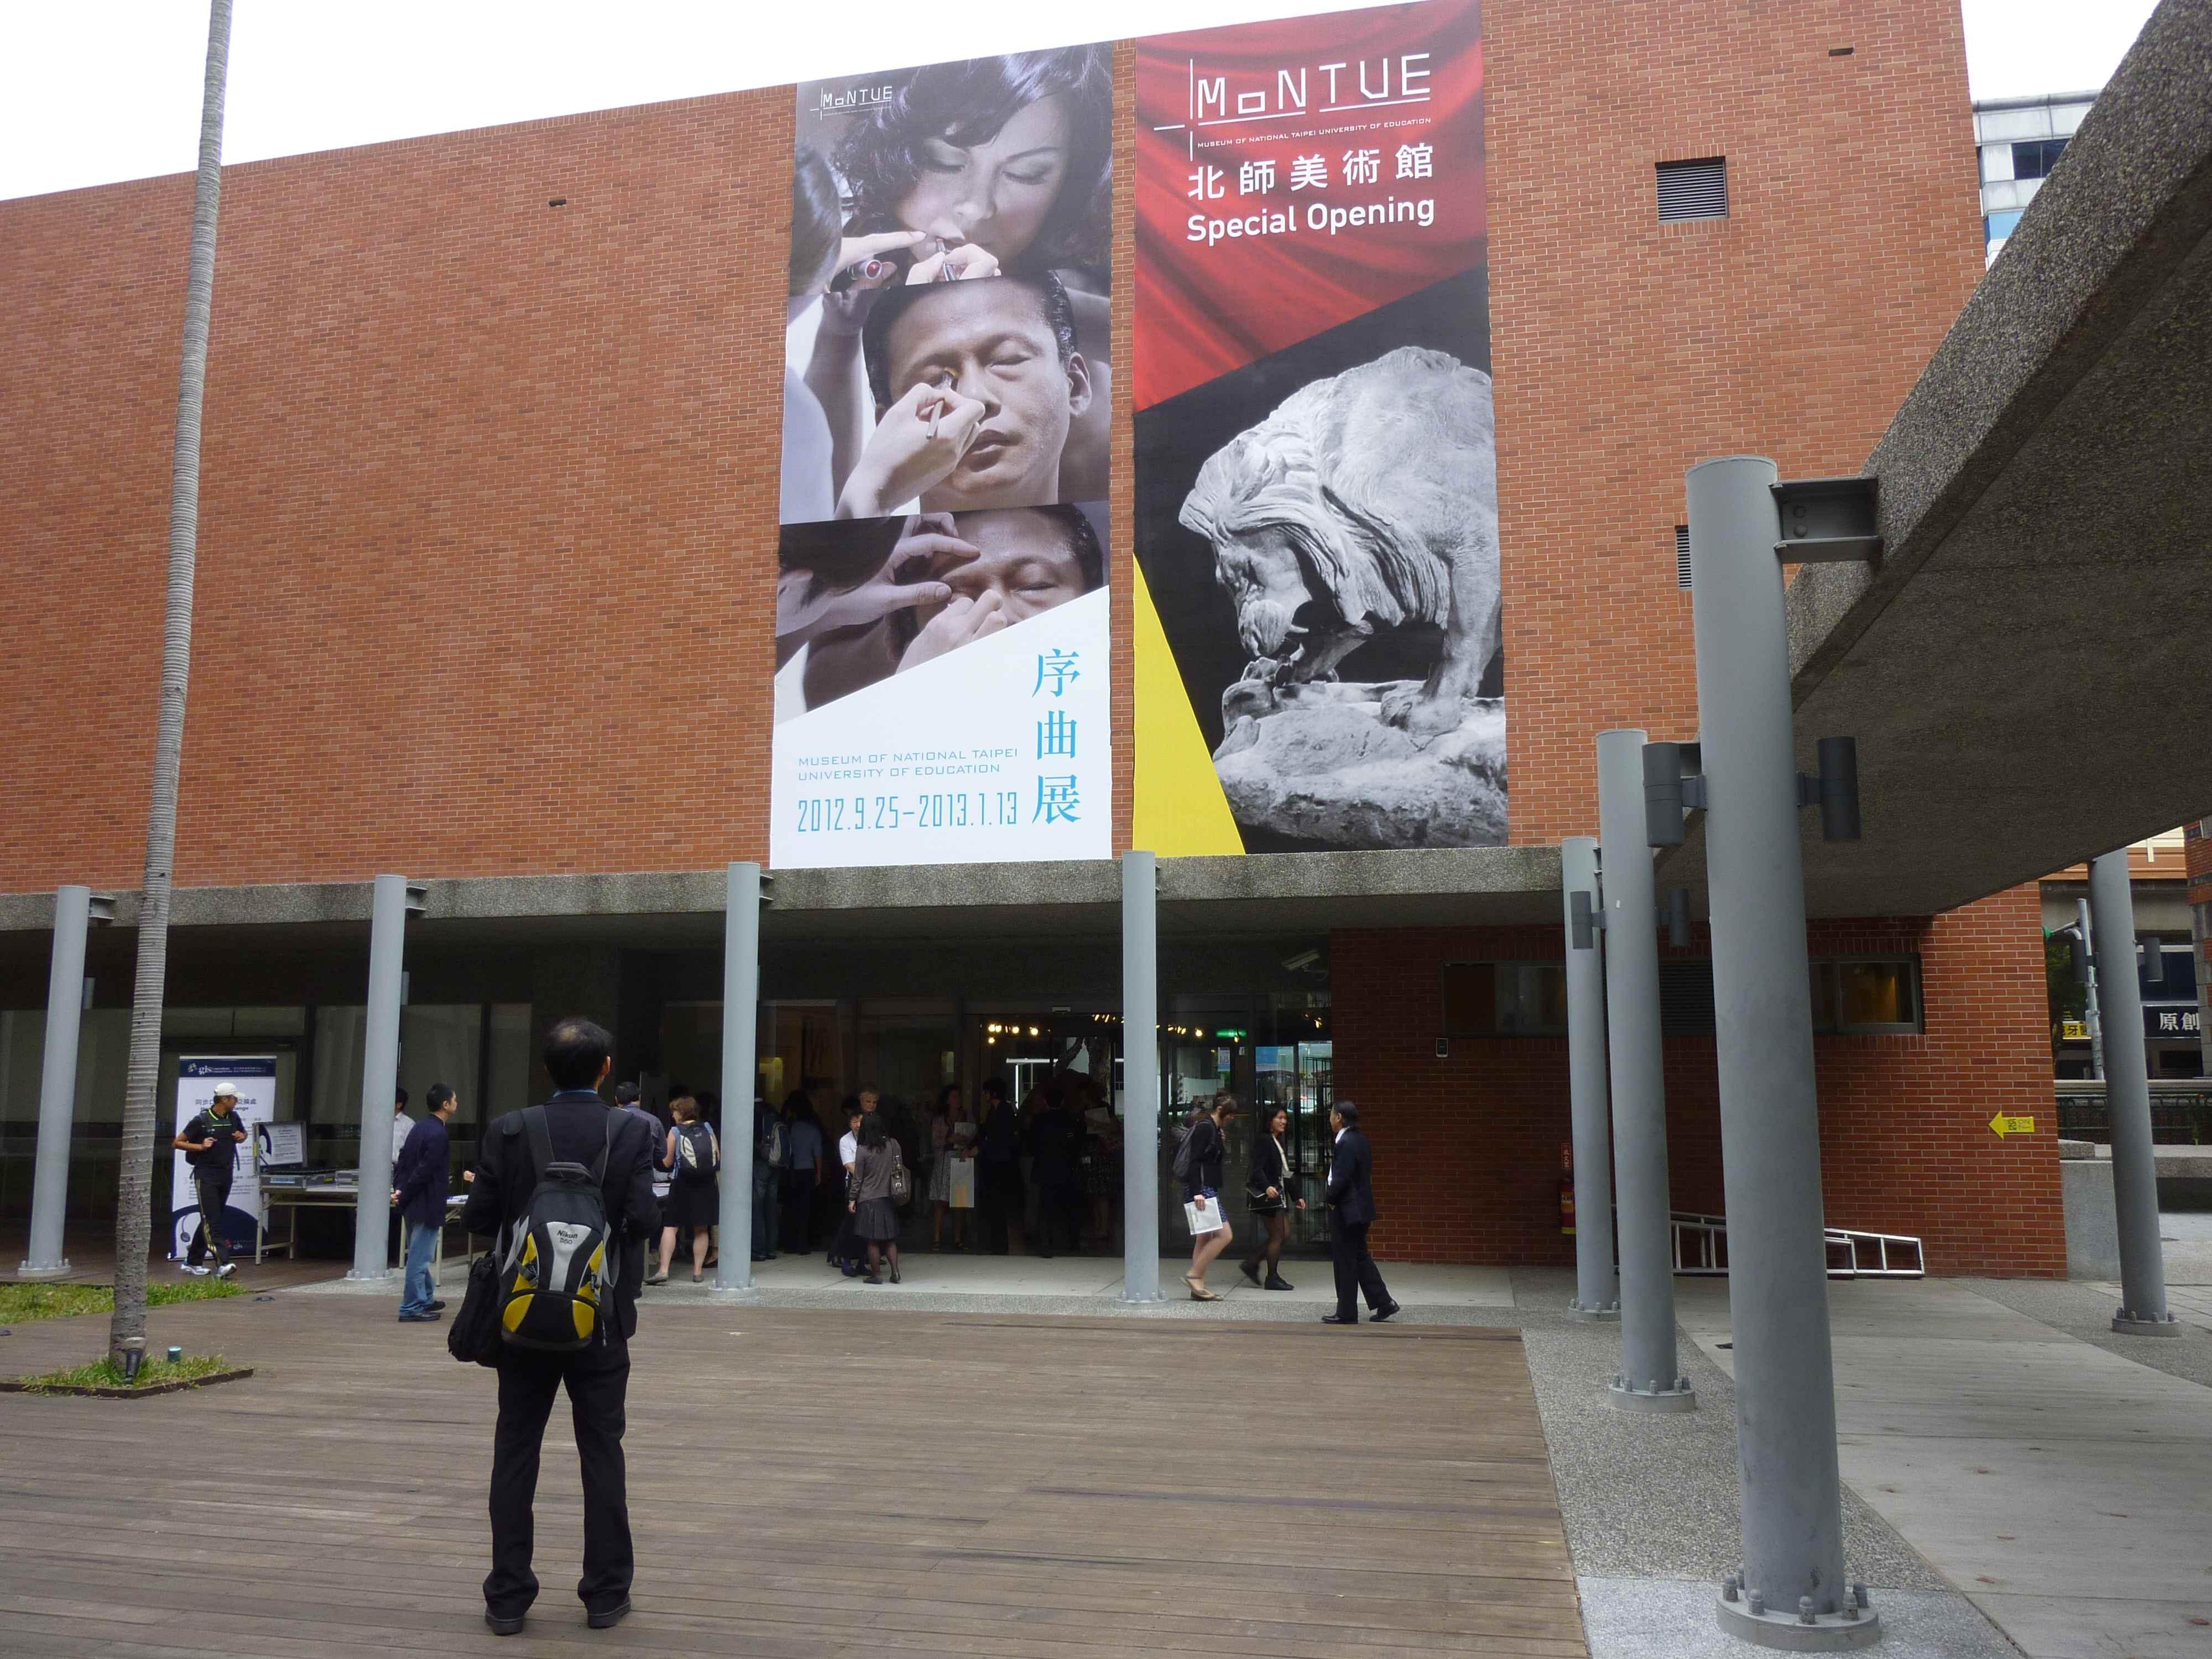 historisches-museum-frankfurt_Museum-of-NTUE_eingang